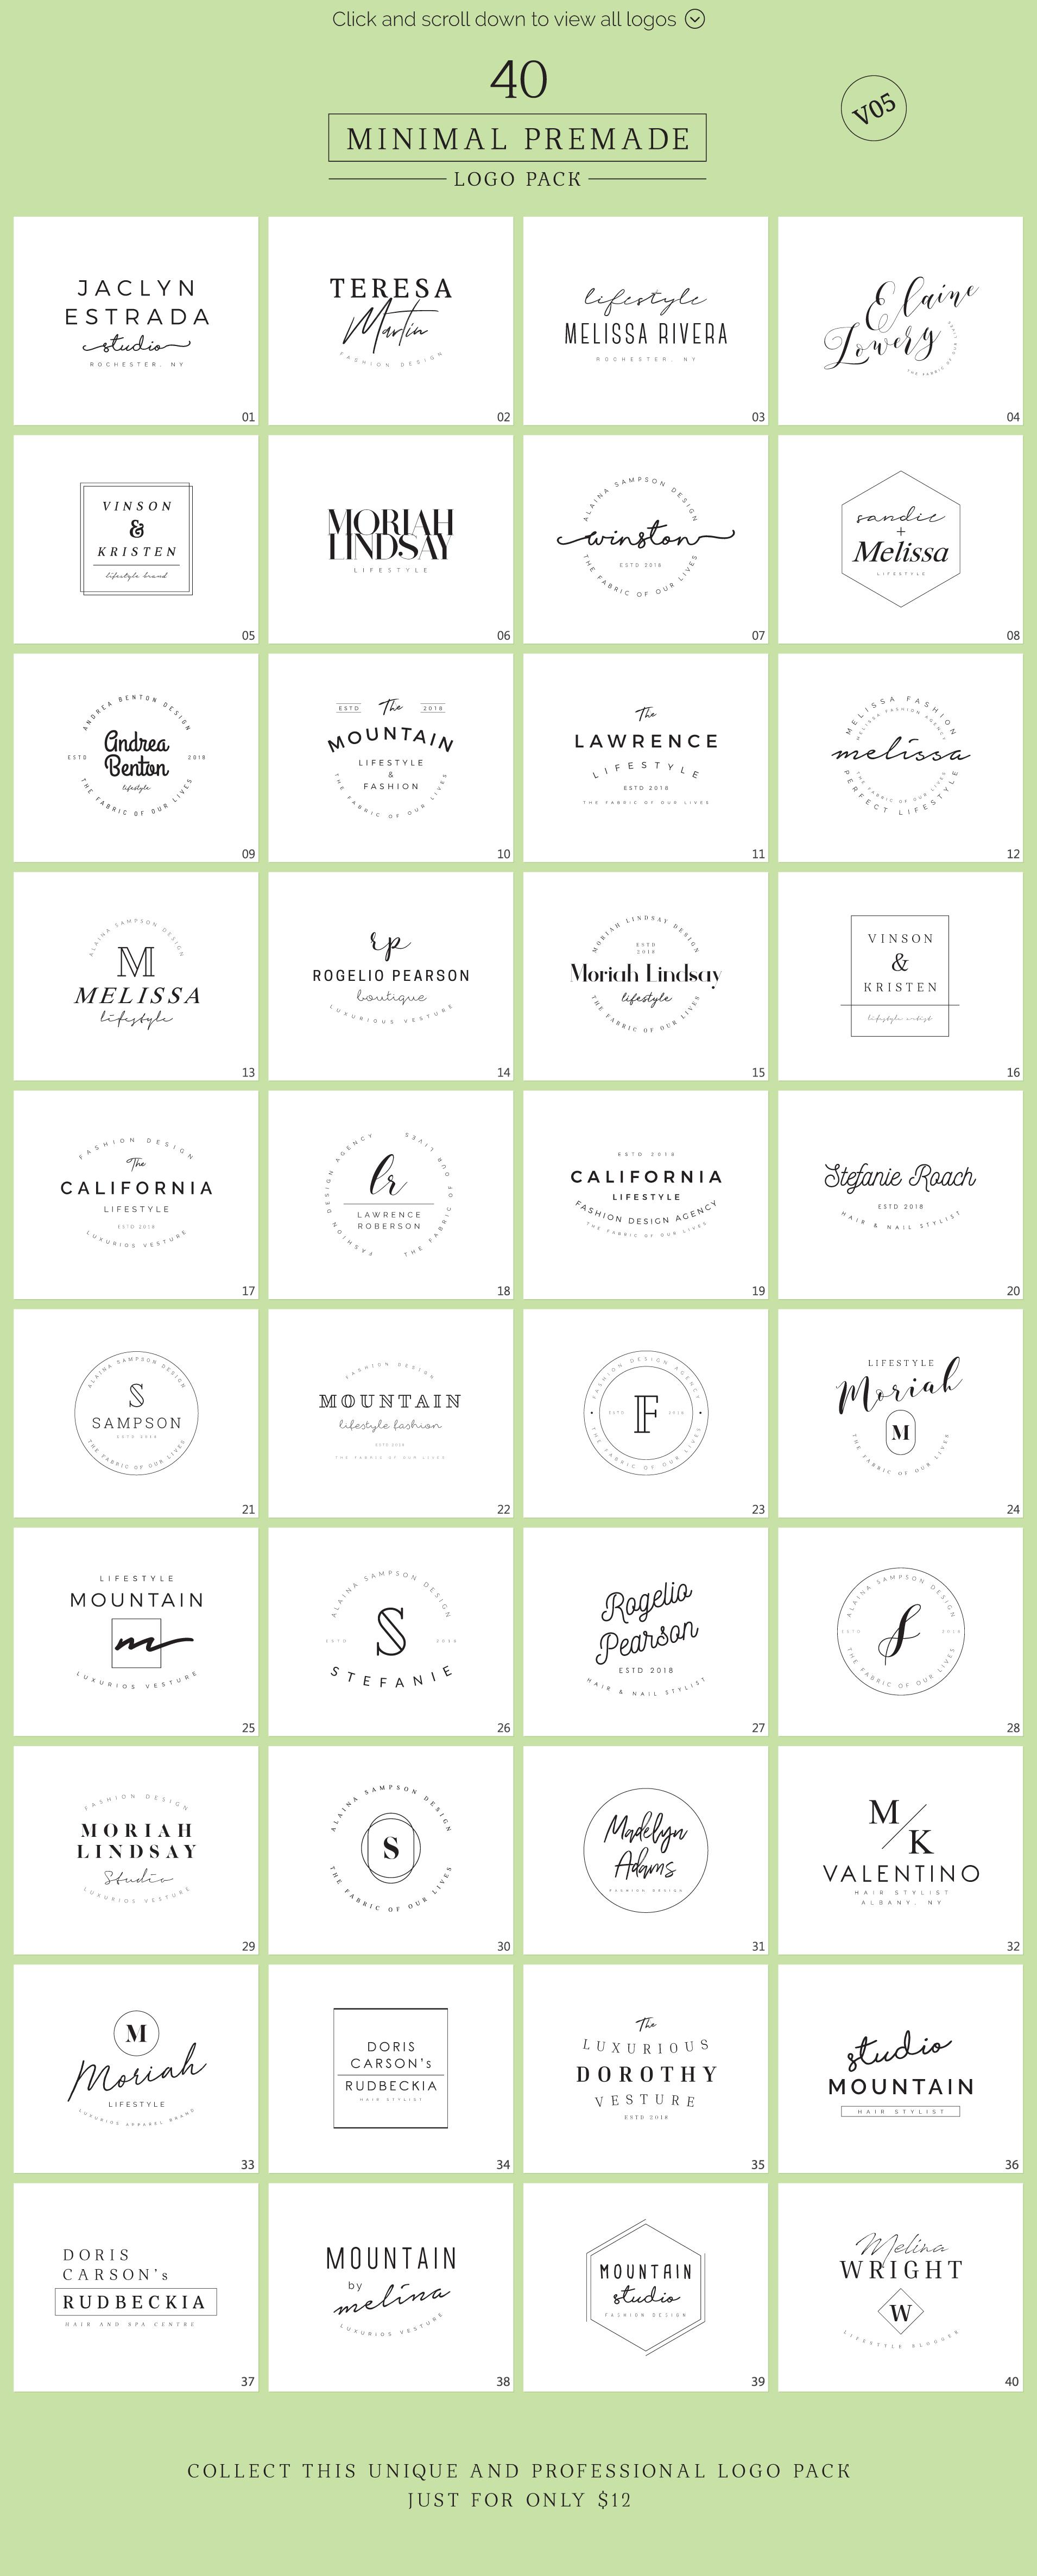 640 Premade Logos Mega Bundle example image 24